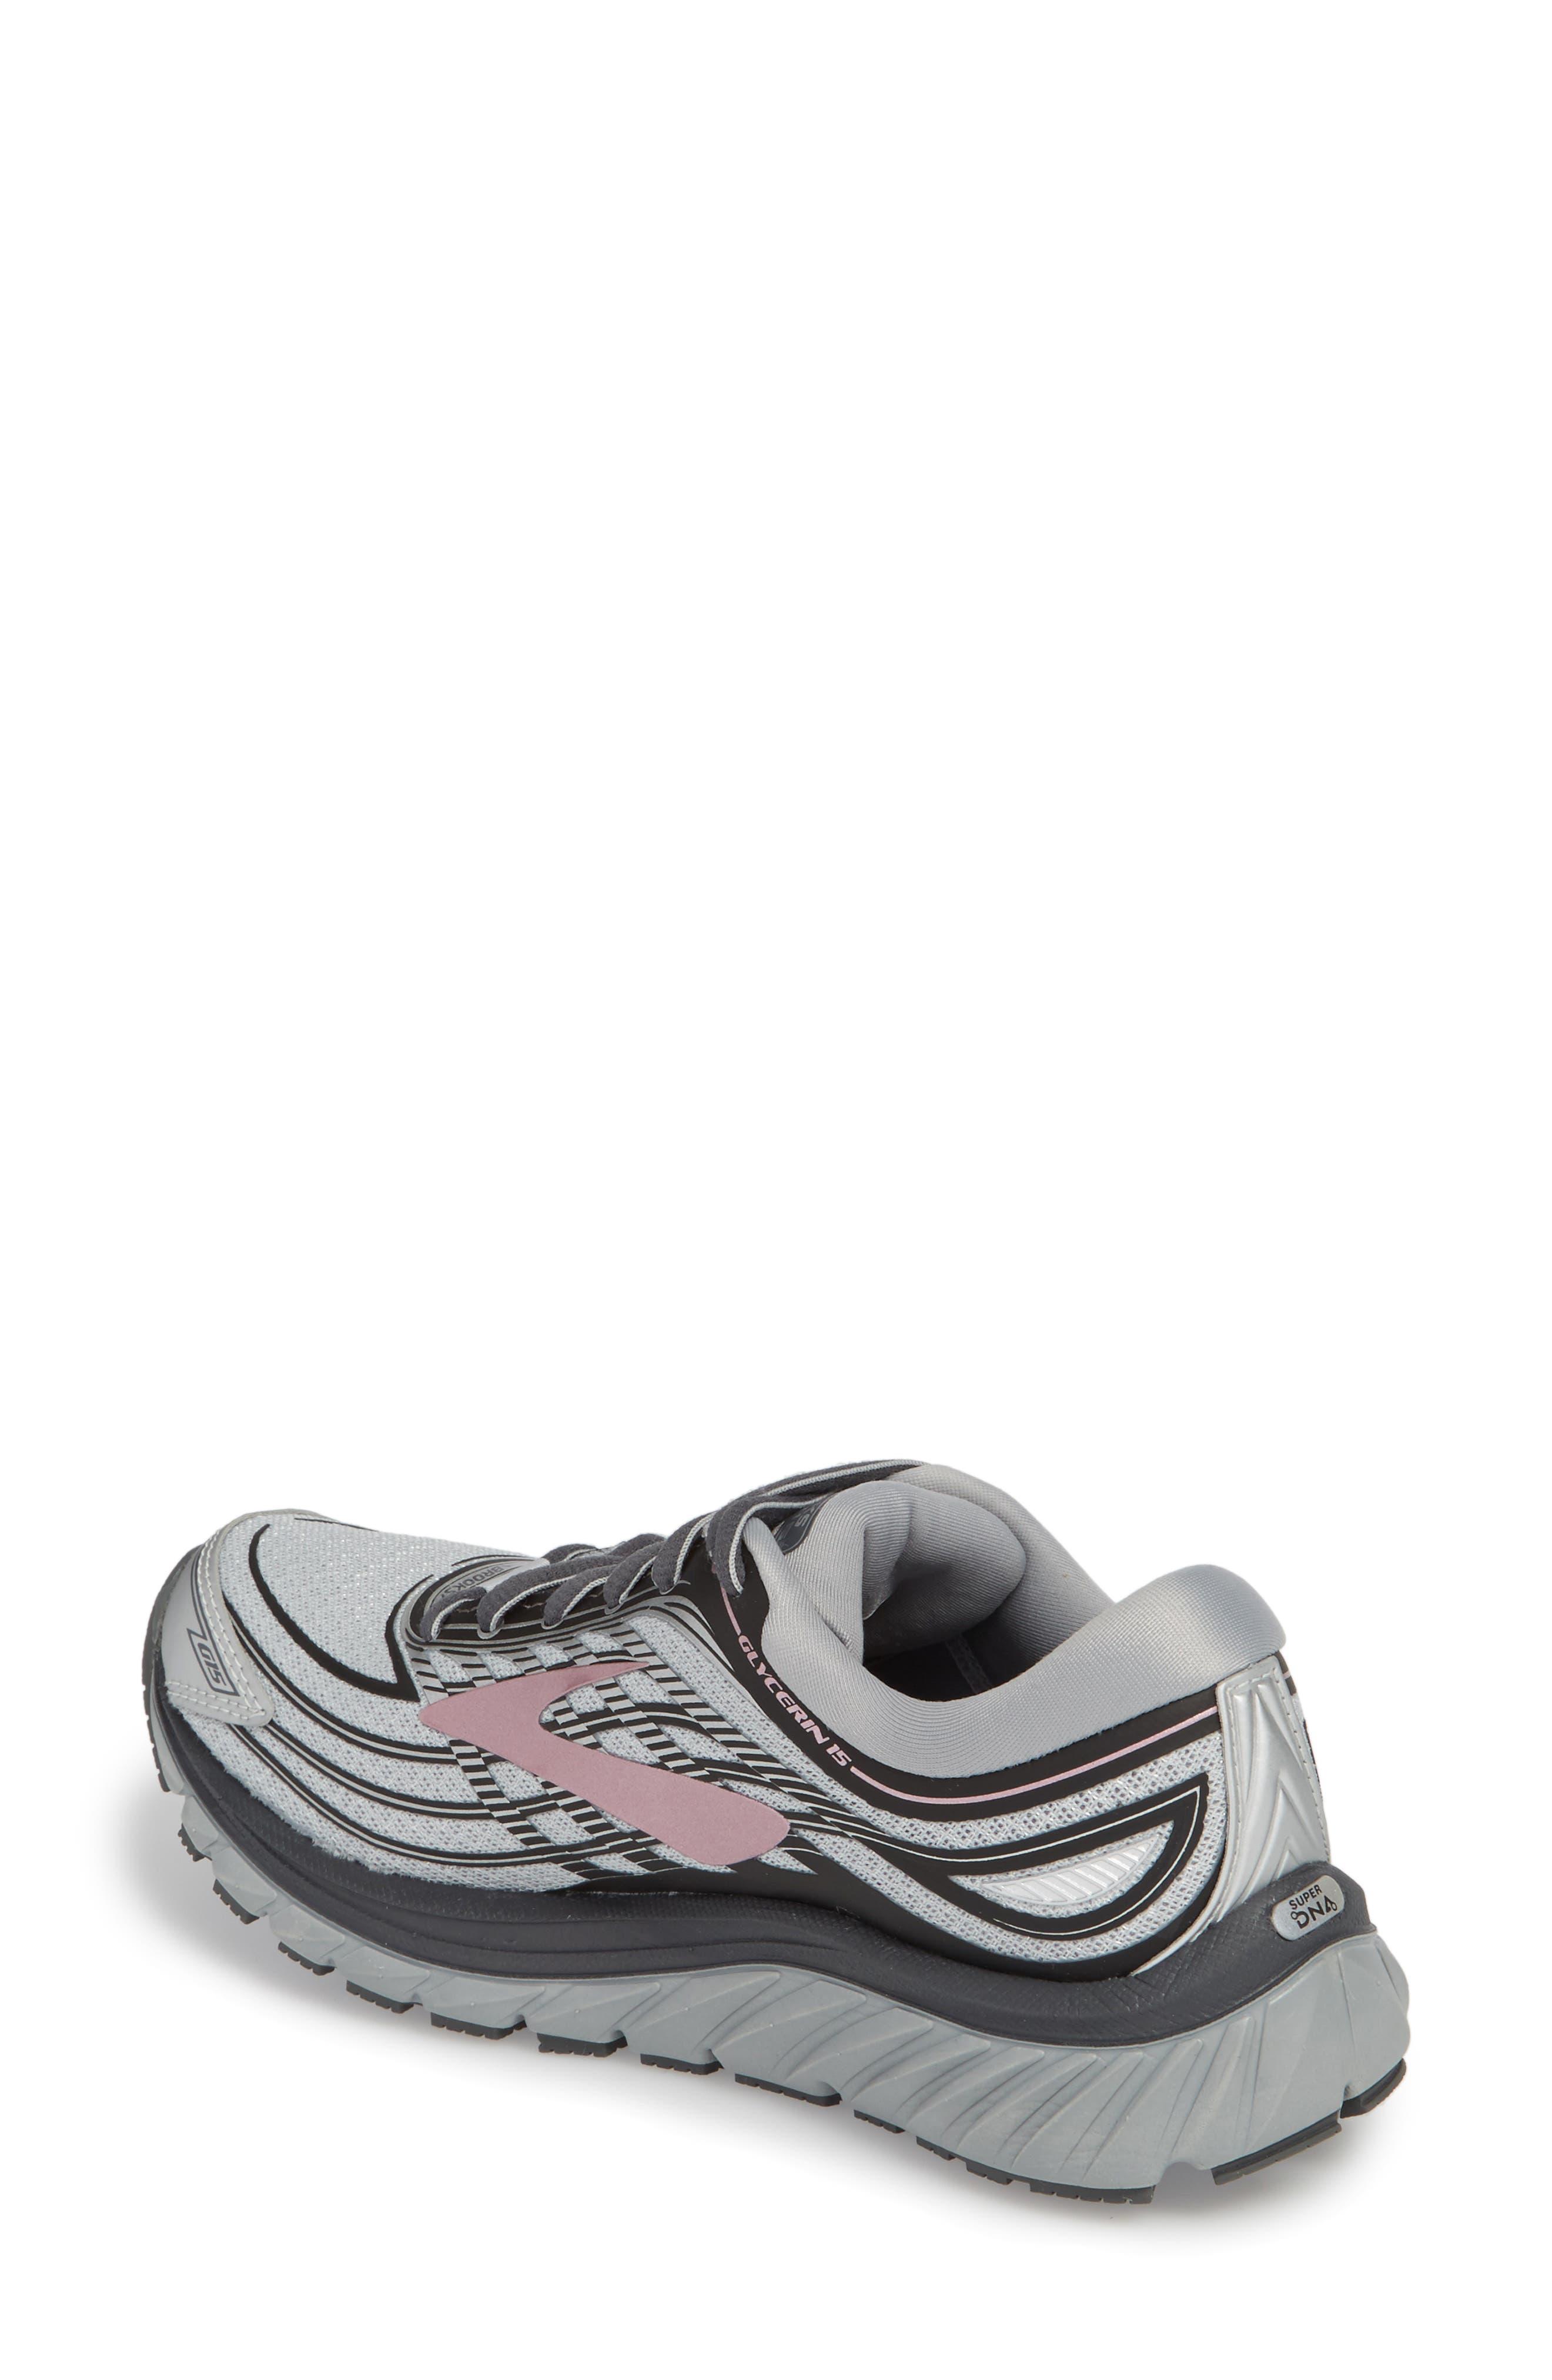 Glycerin 15 Running Shoe,                             Alternate thumbnail 2, color,                             Silver/ Grey/ Rose